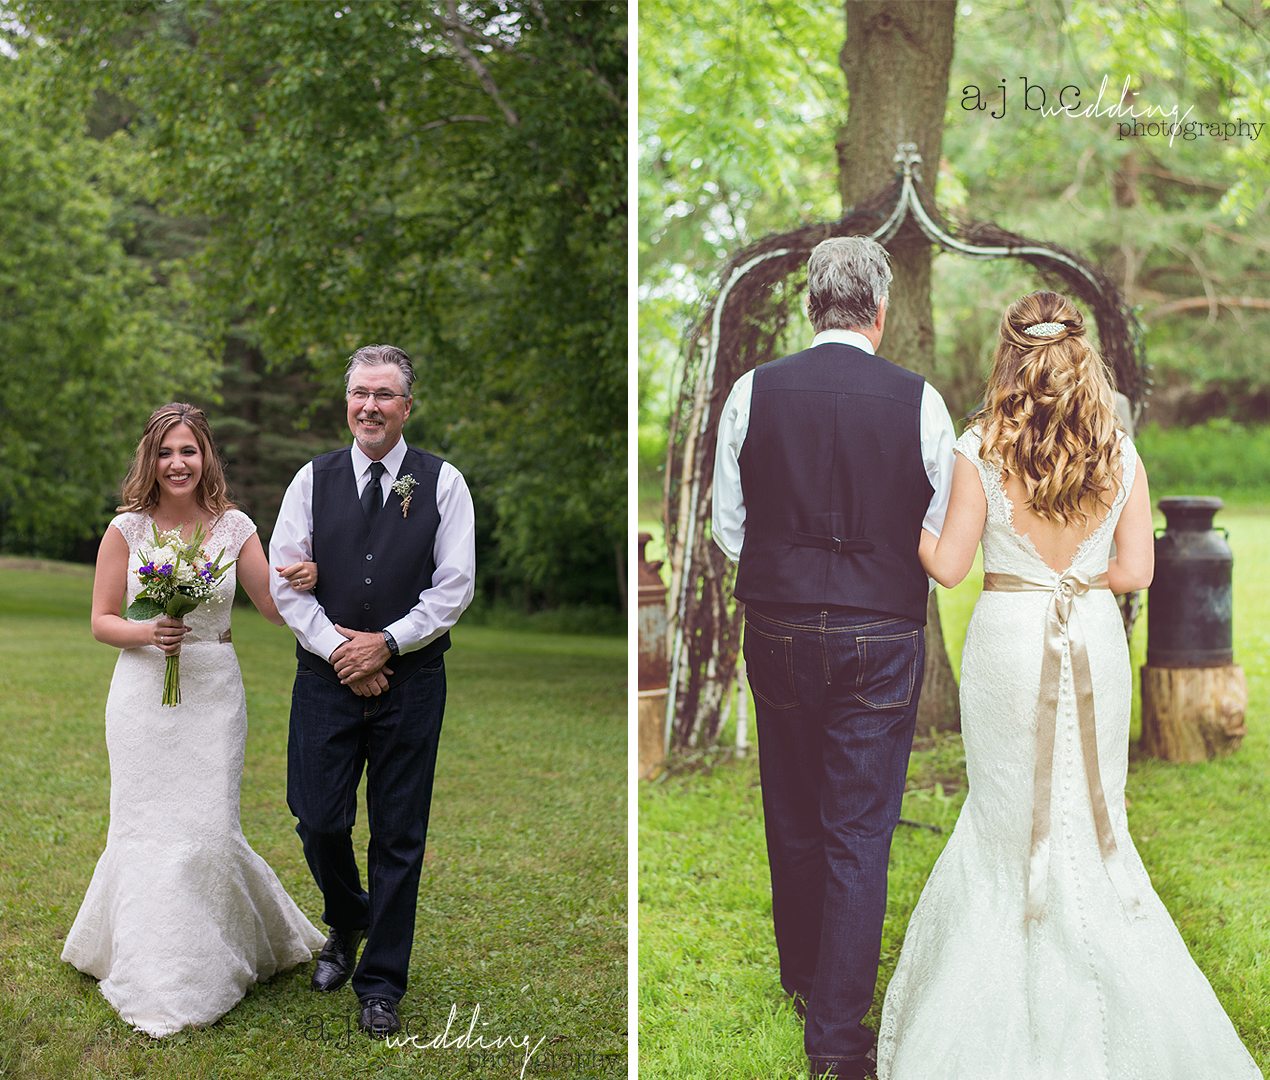 ajbcphotography-port-huron-michigan-wedding-photographer-outdoors-summer-wedding-country-wedding-wadhams-michigan-bride-father-daughter.jpg